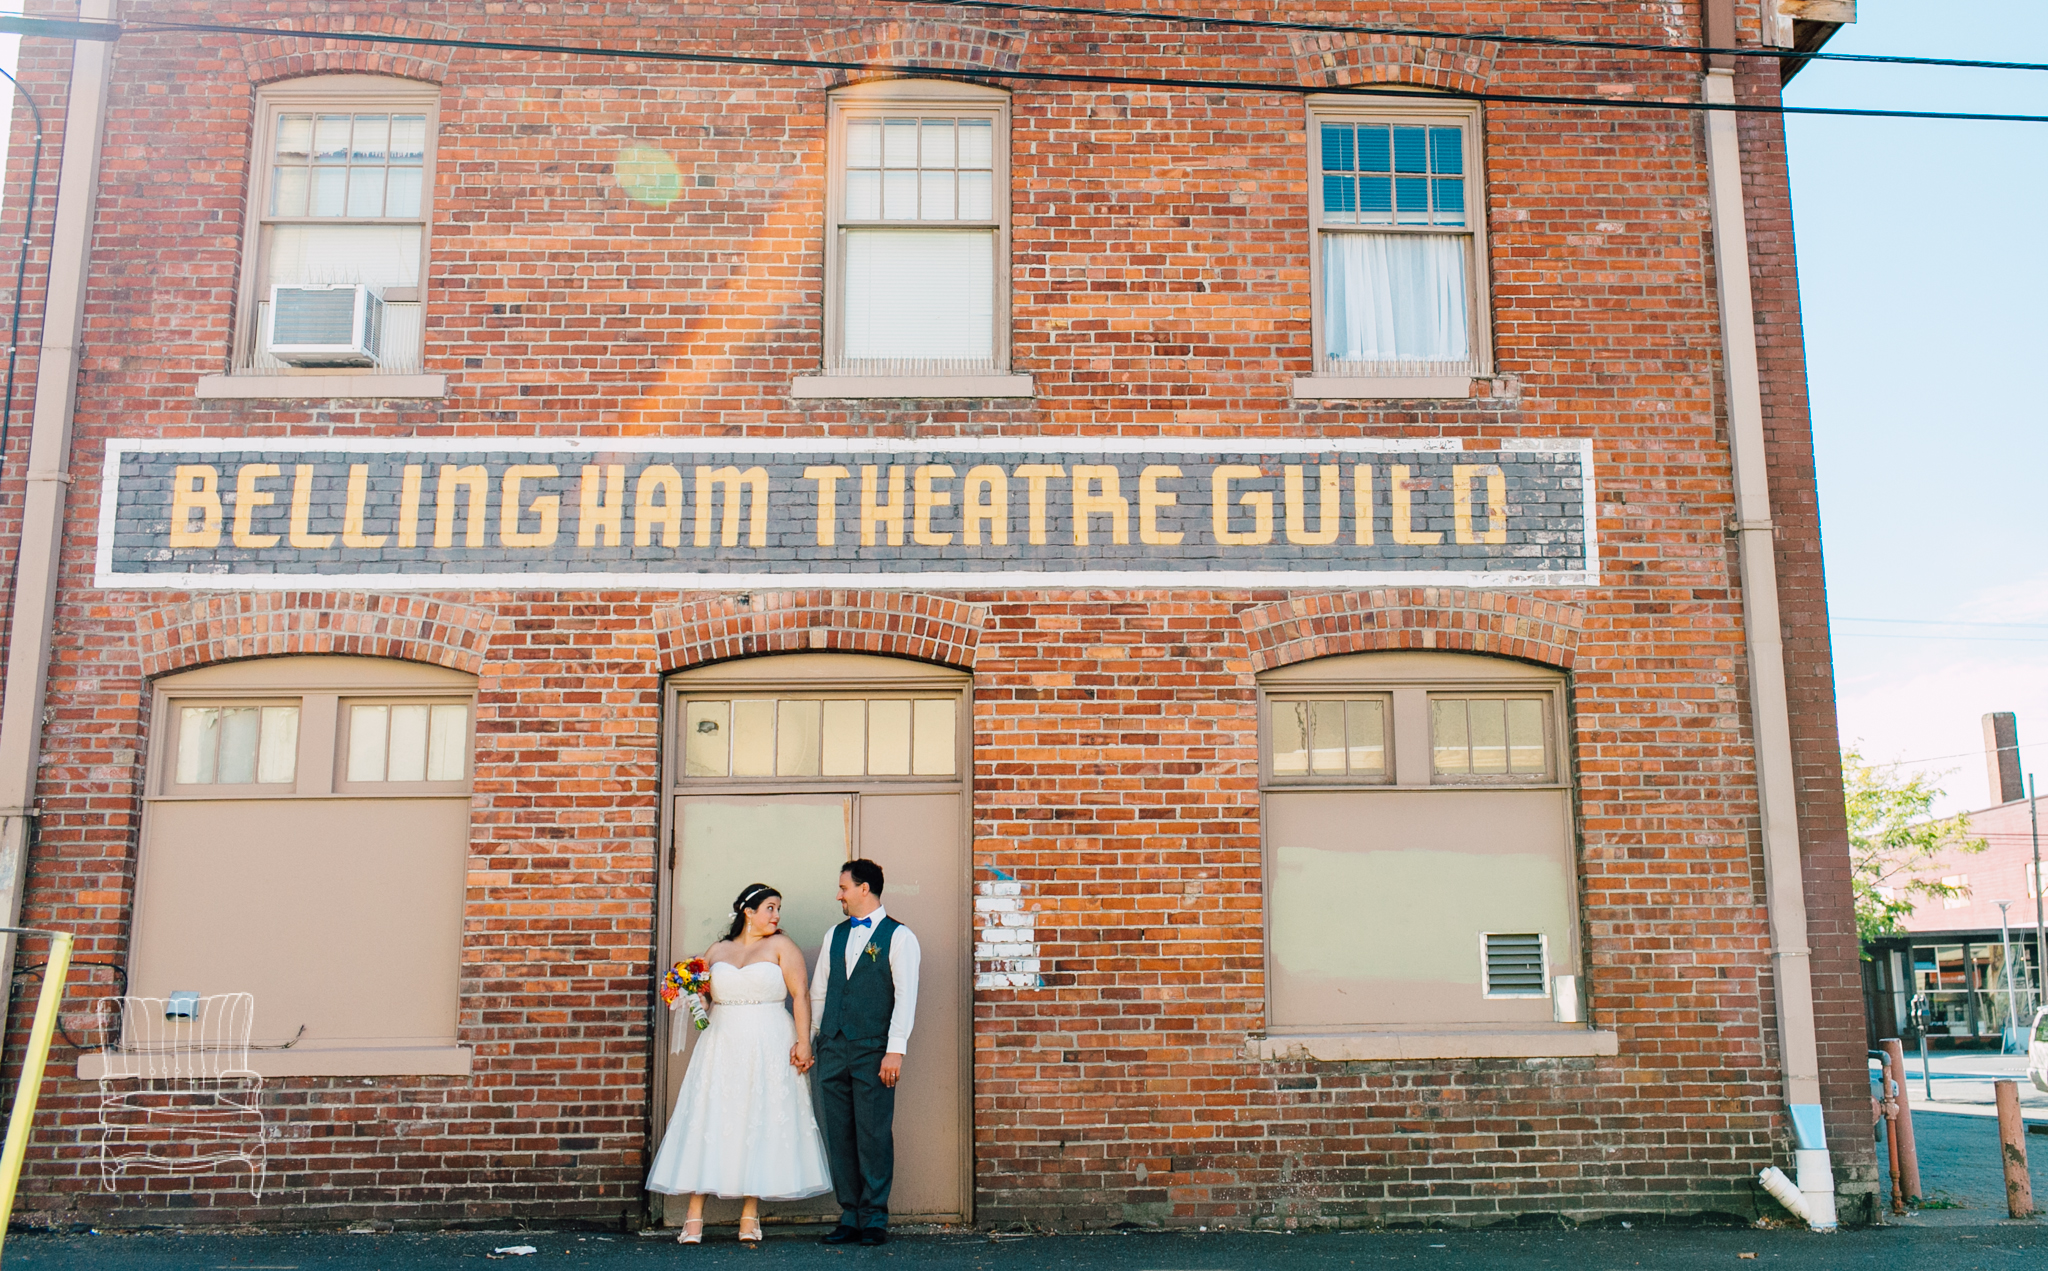 bellingham-whatcom-museum-wedding-katheryn-moran-photography-bribran-9.jpg